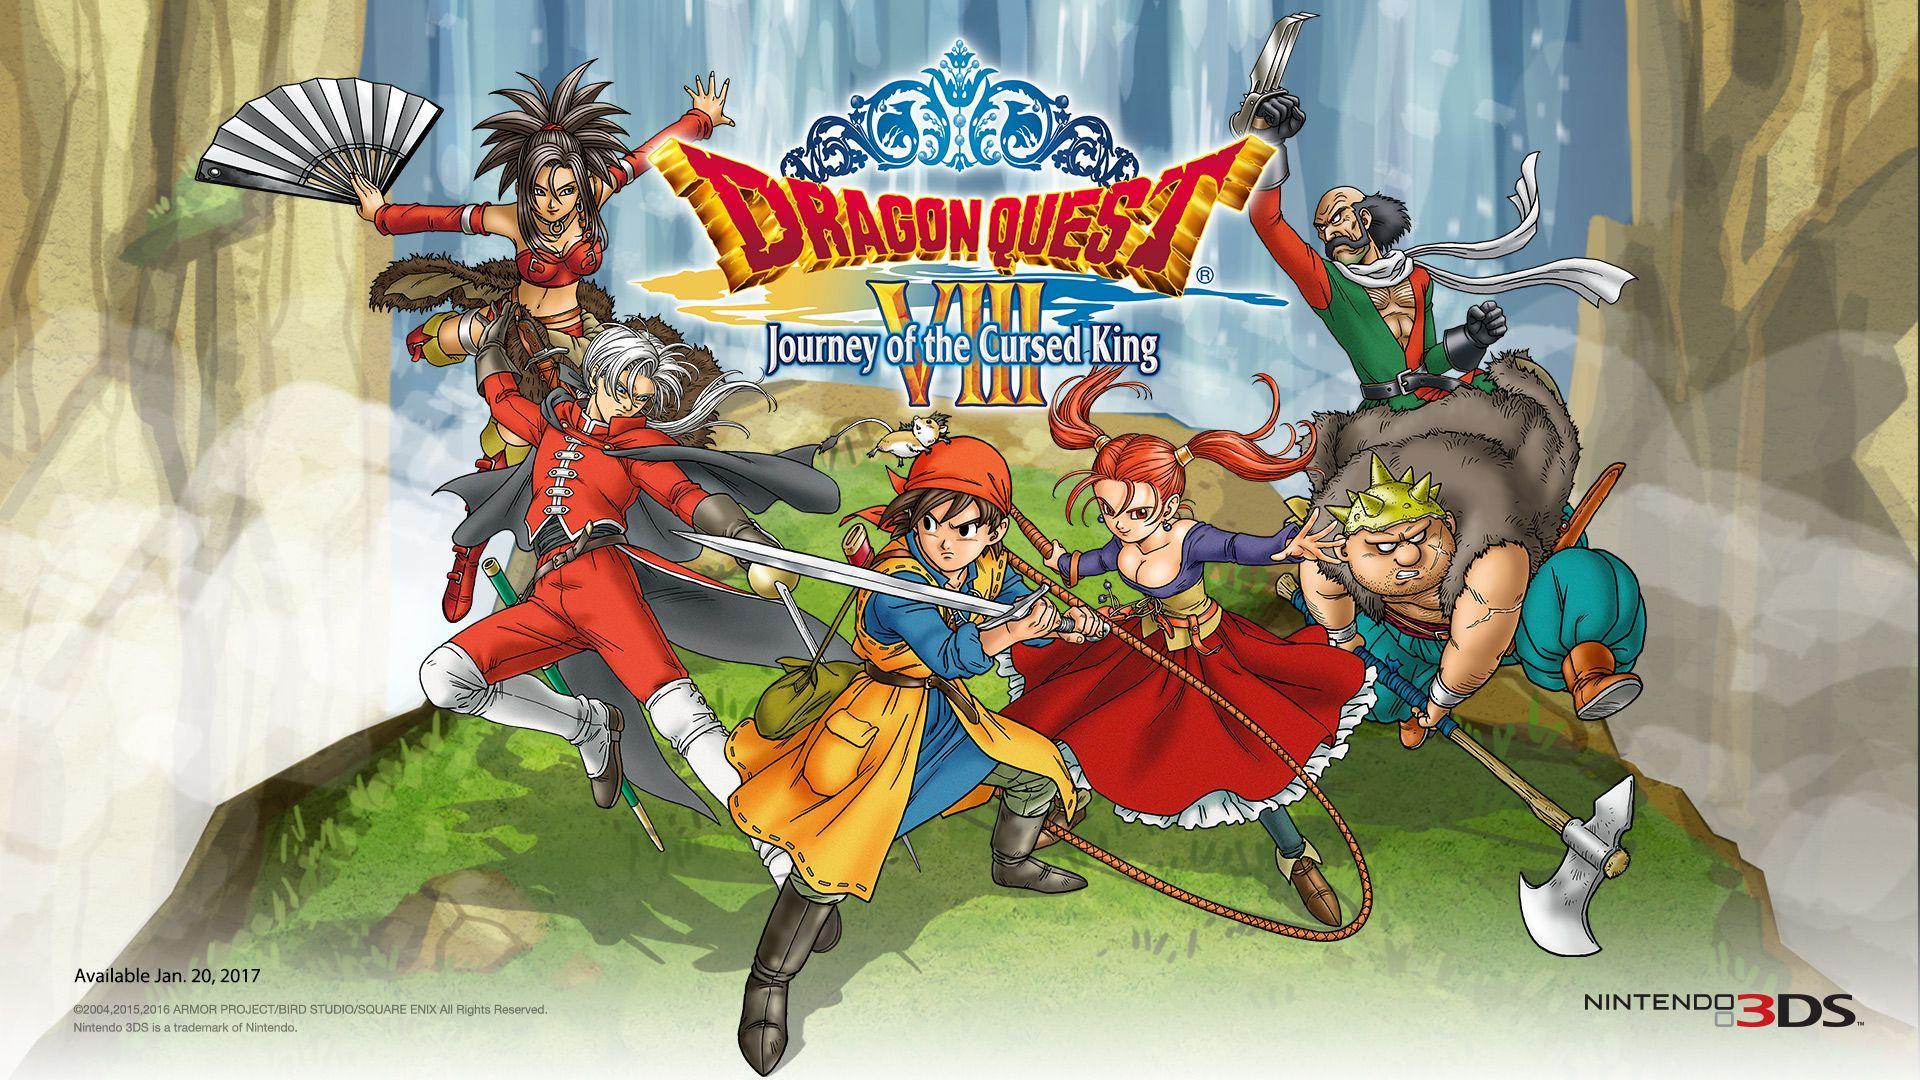 Dragon Quest Wallpapers - Top Free Dragon Quest ...